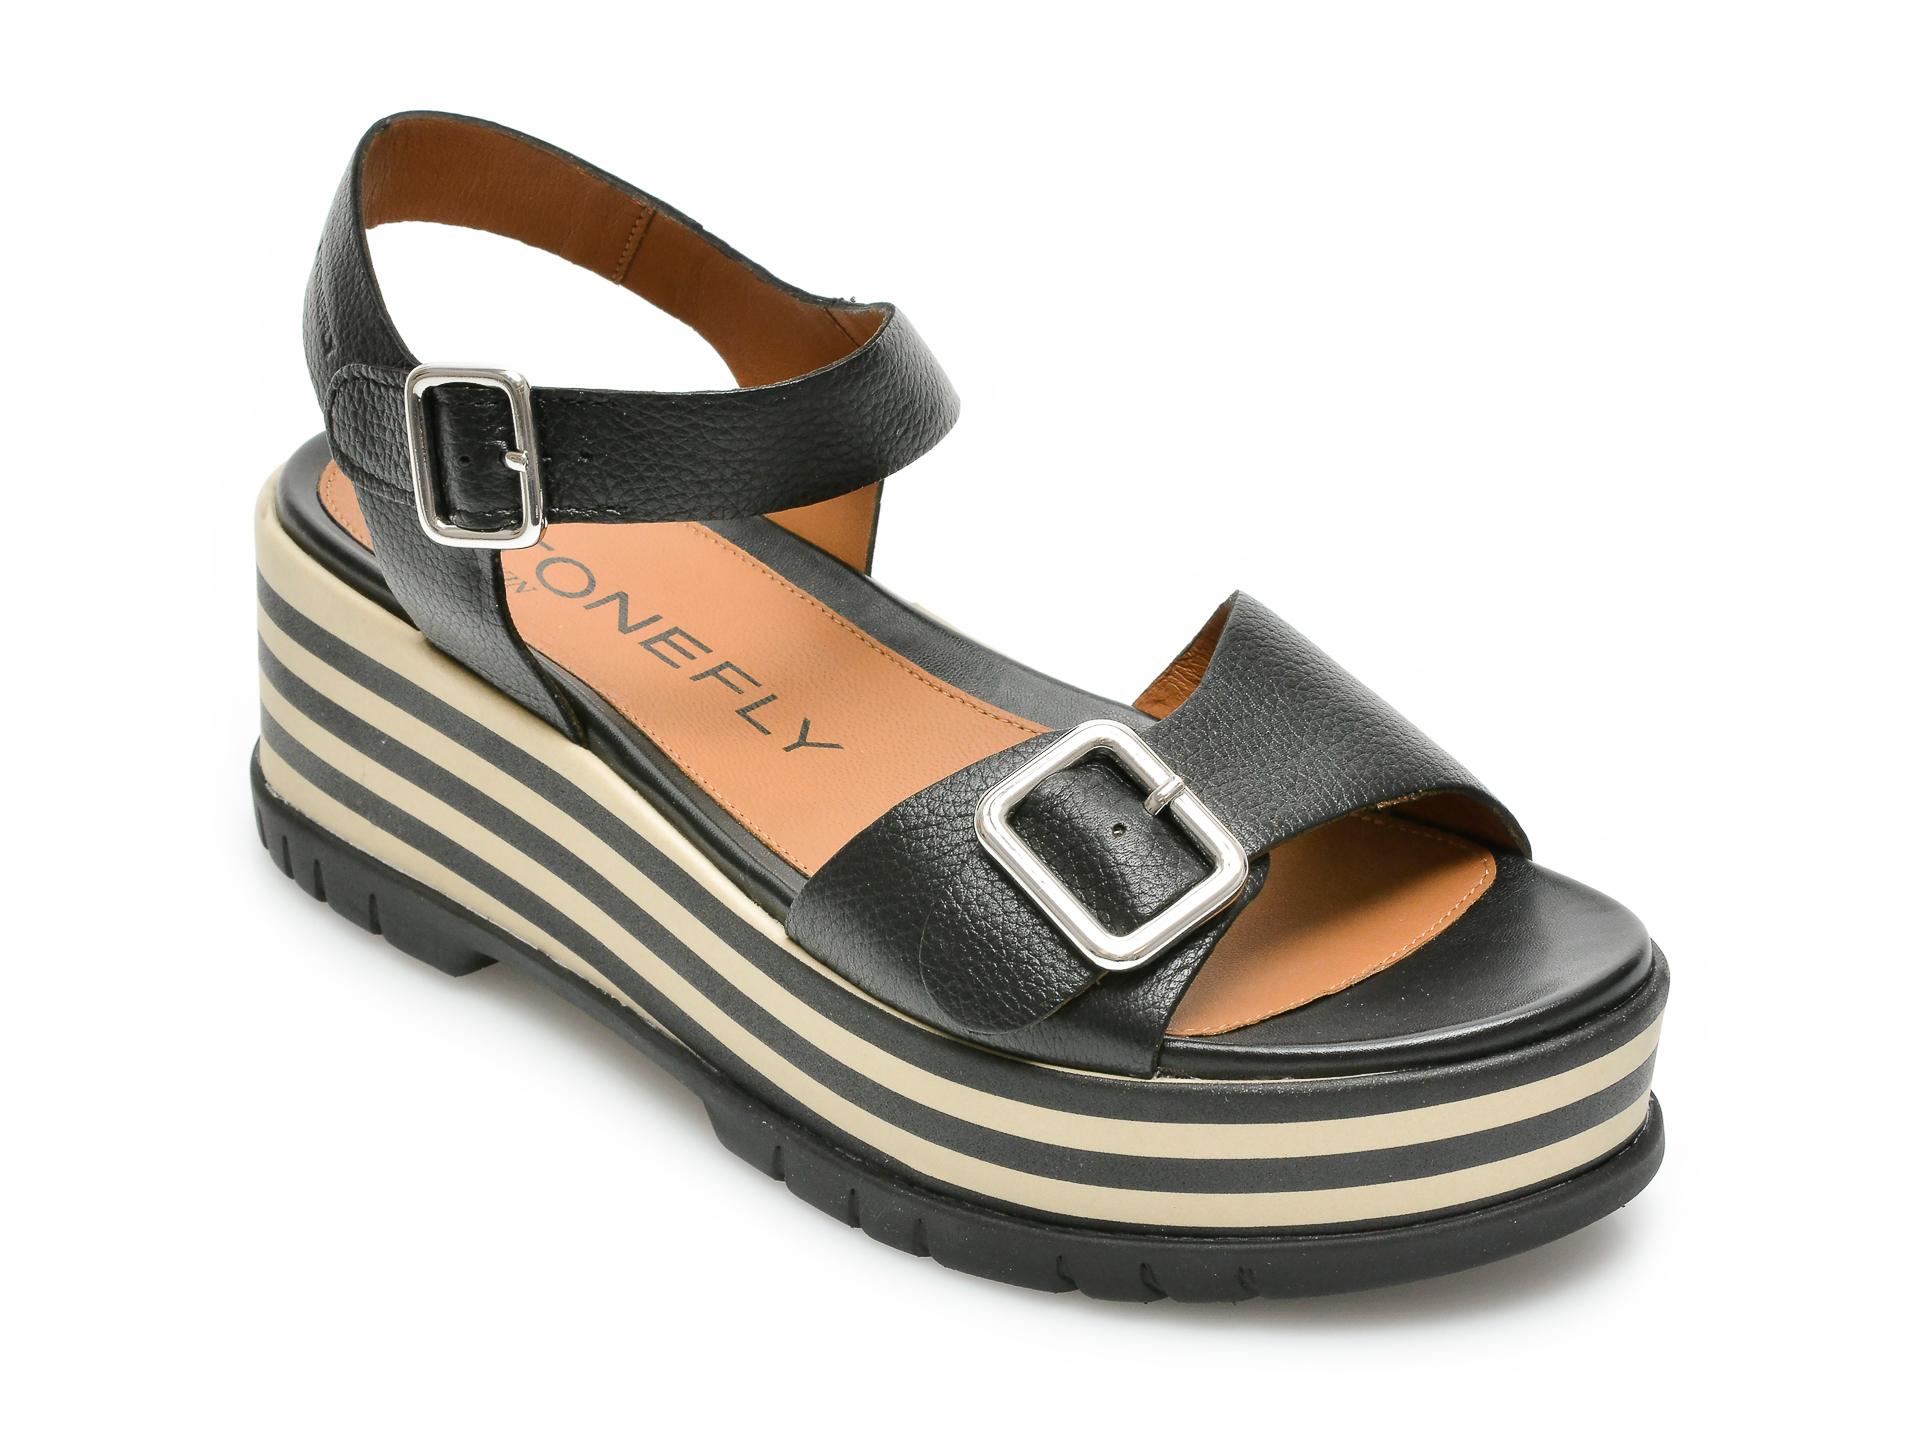 Sandale STONEFLY negre, Kris4, din piele naturala